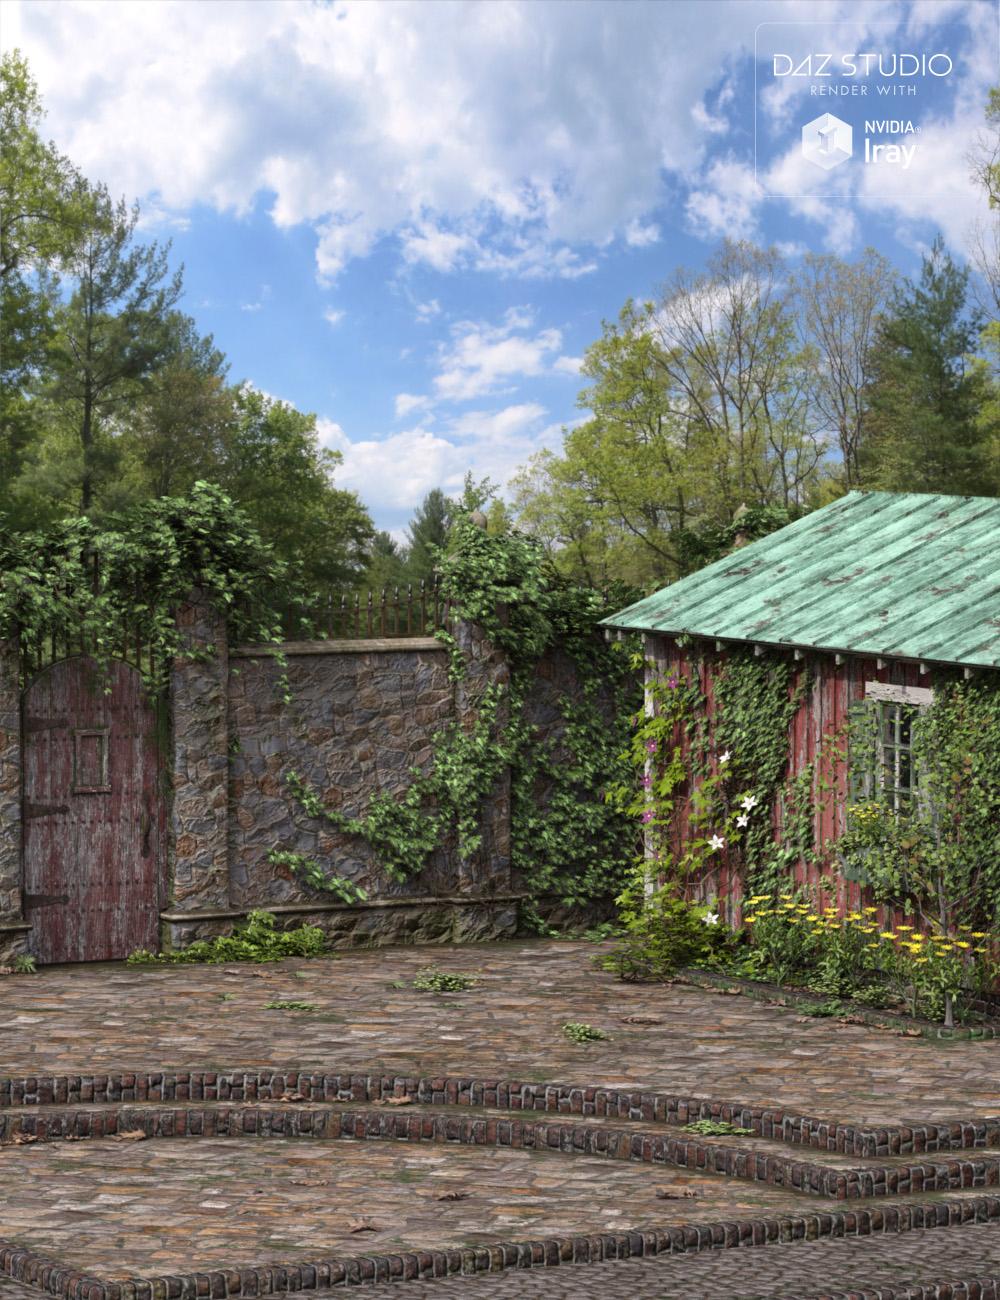 Old Garden - Structures by: Dumor3D, 3D Models by Daz 3D